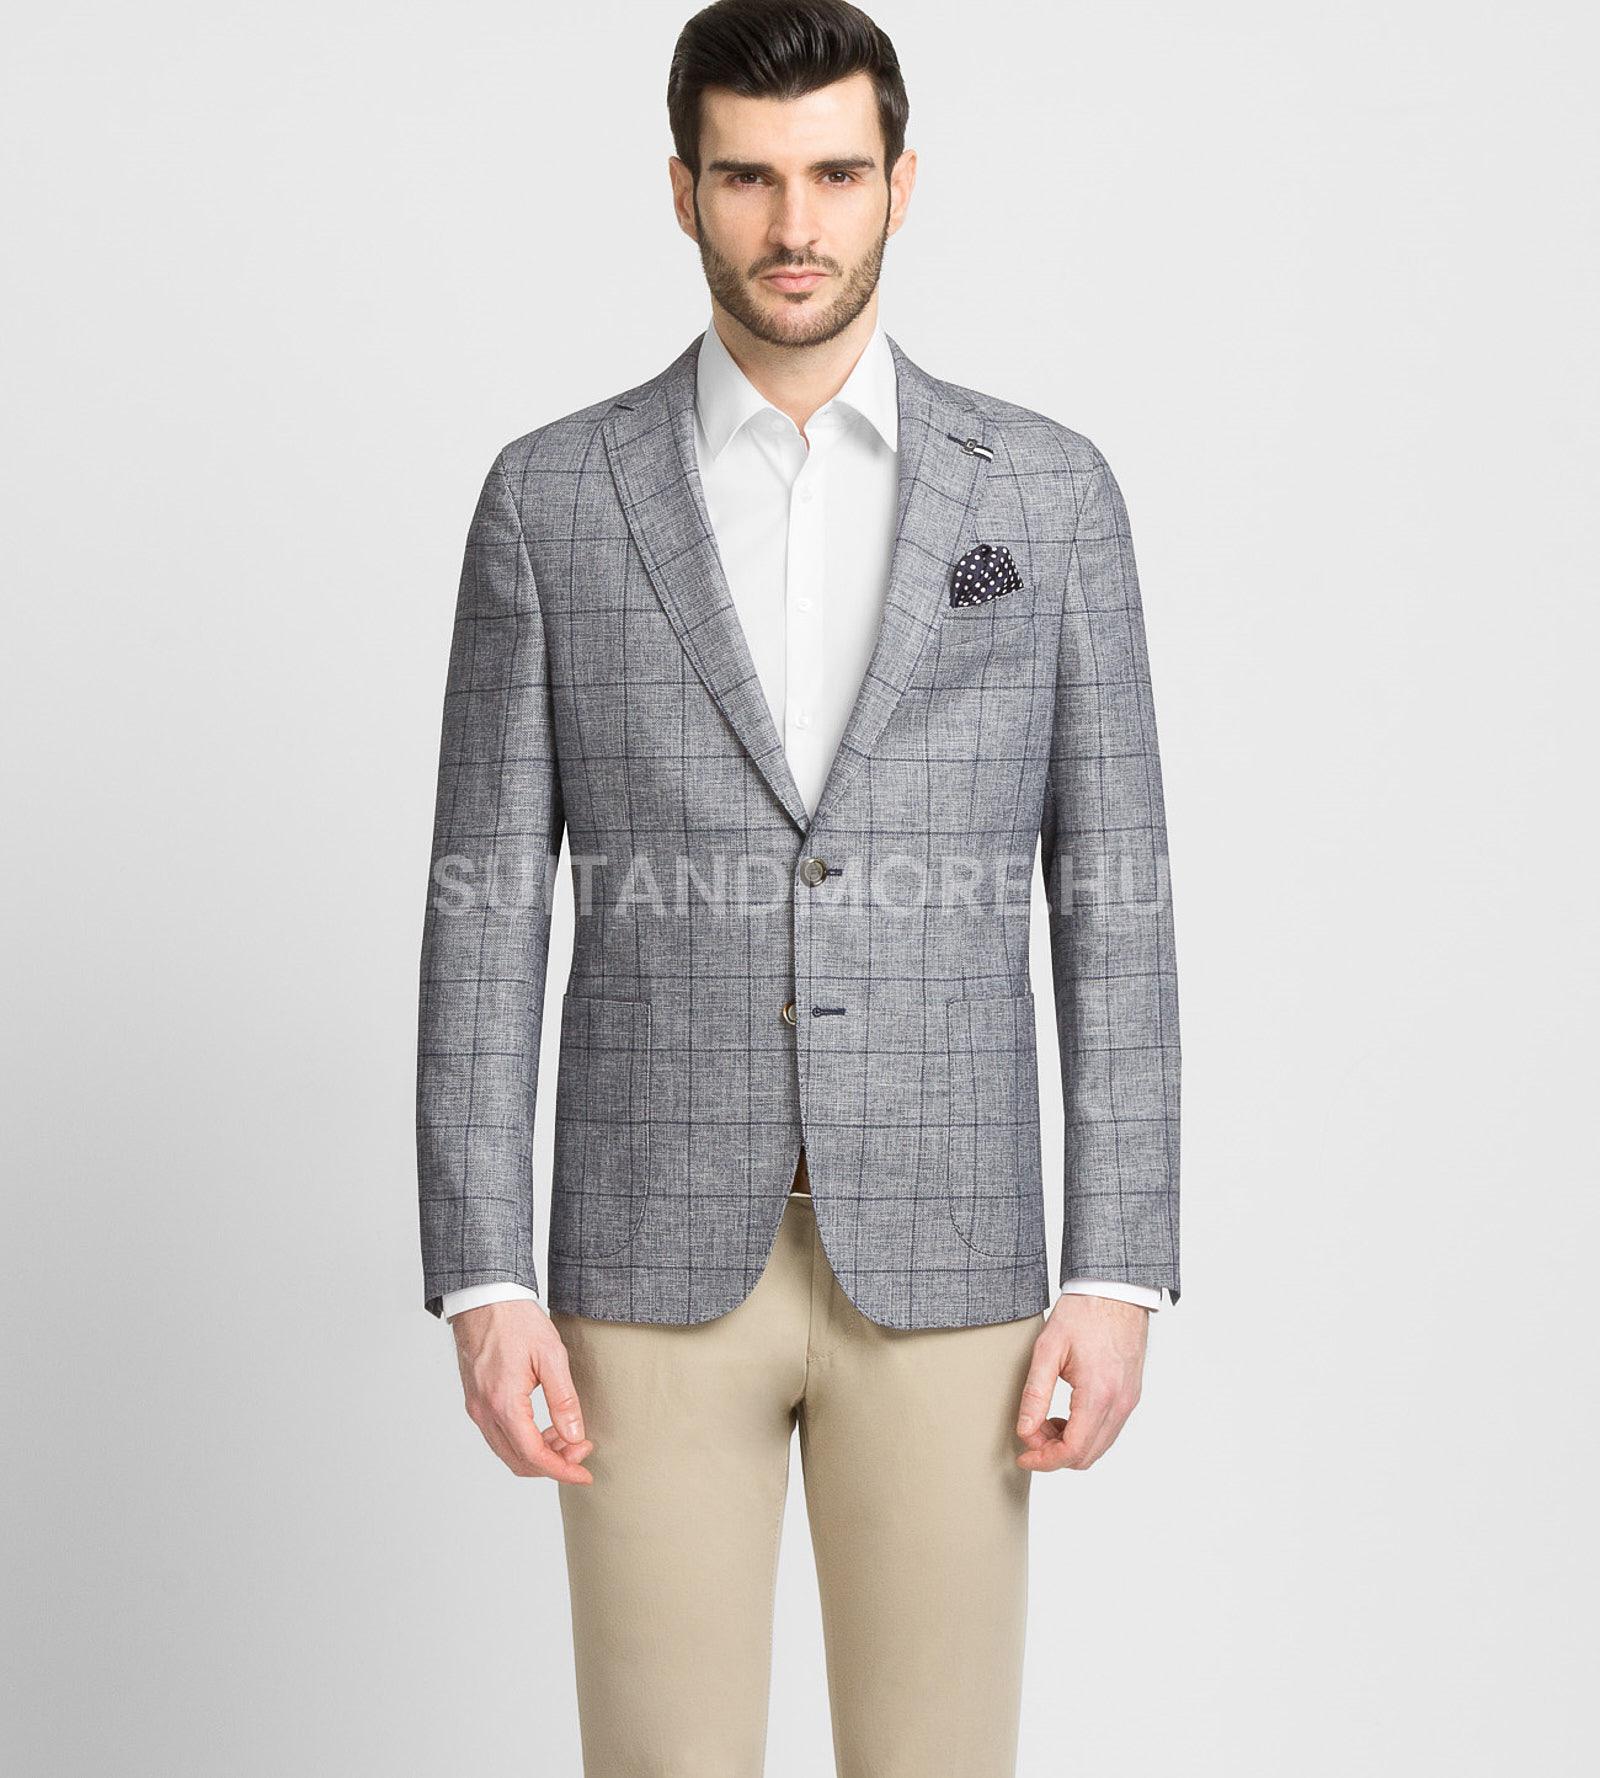 edward-modern-fit-casual-kek-kockas-zako-edward-1172399-27-09